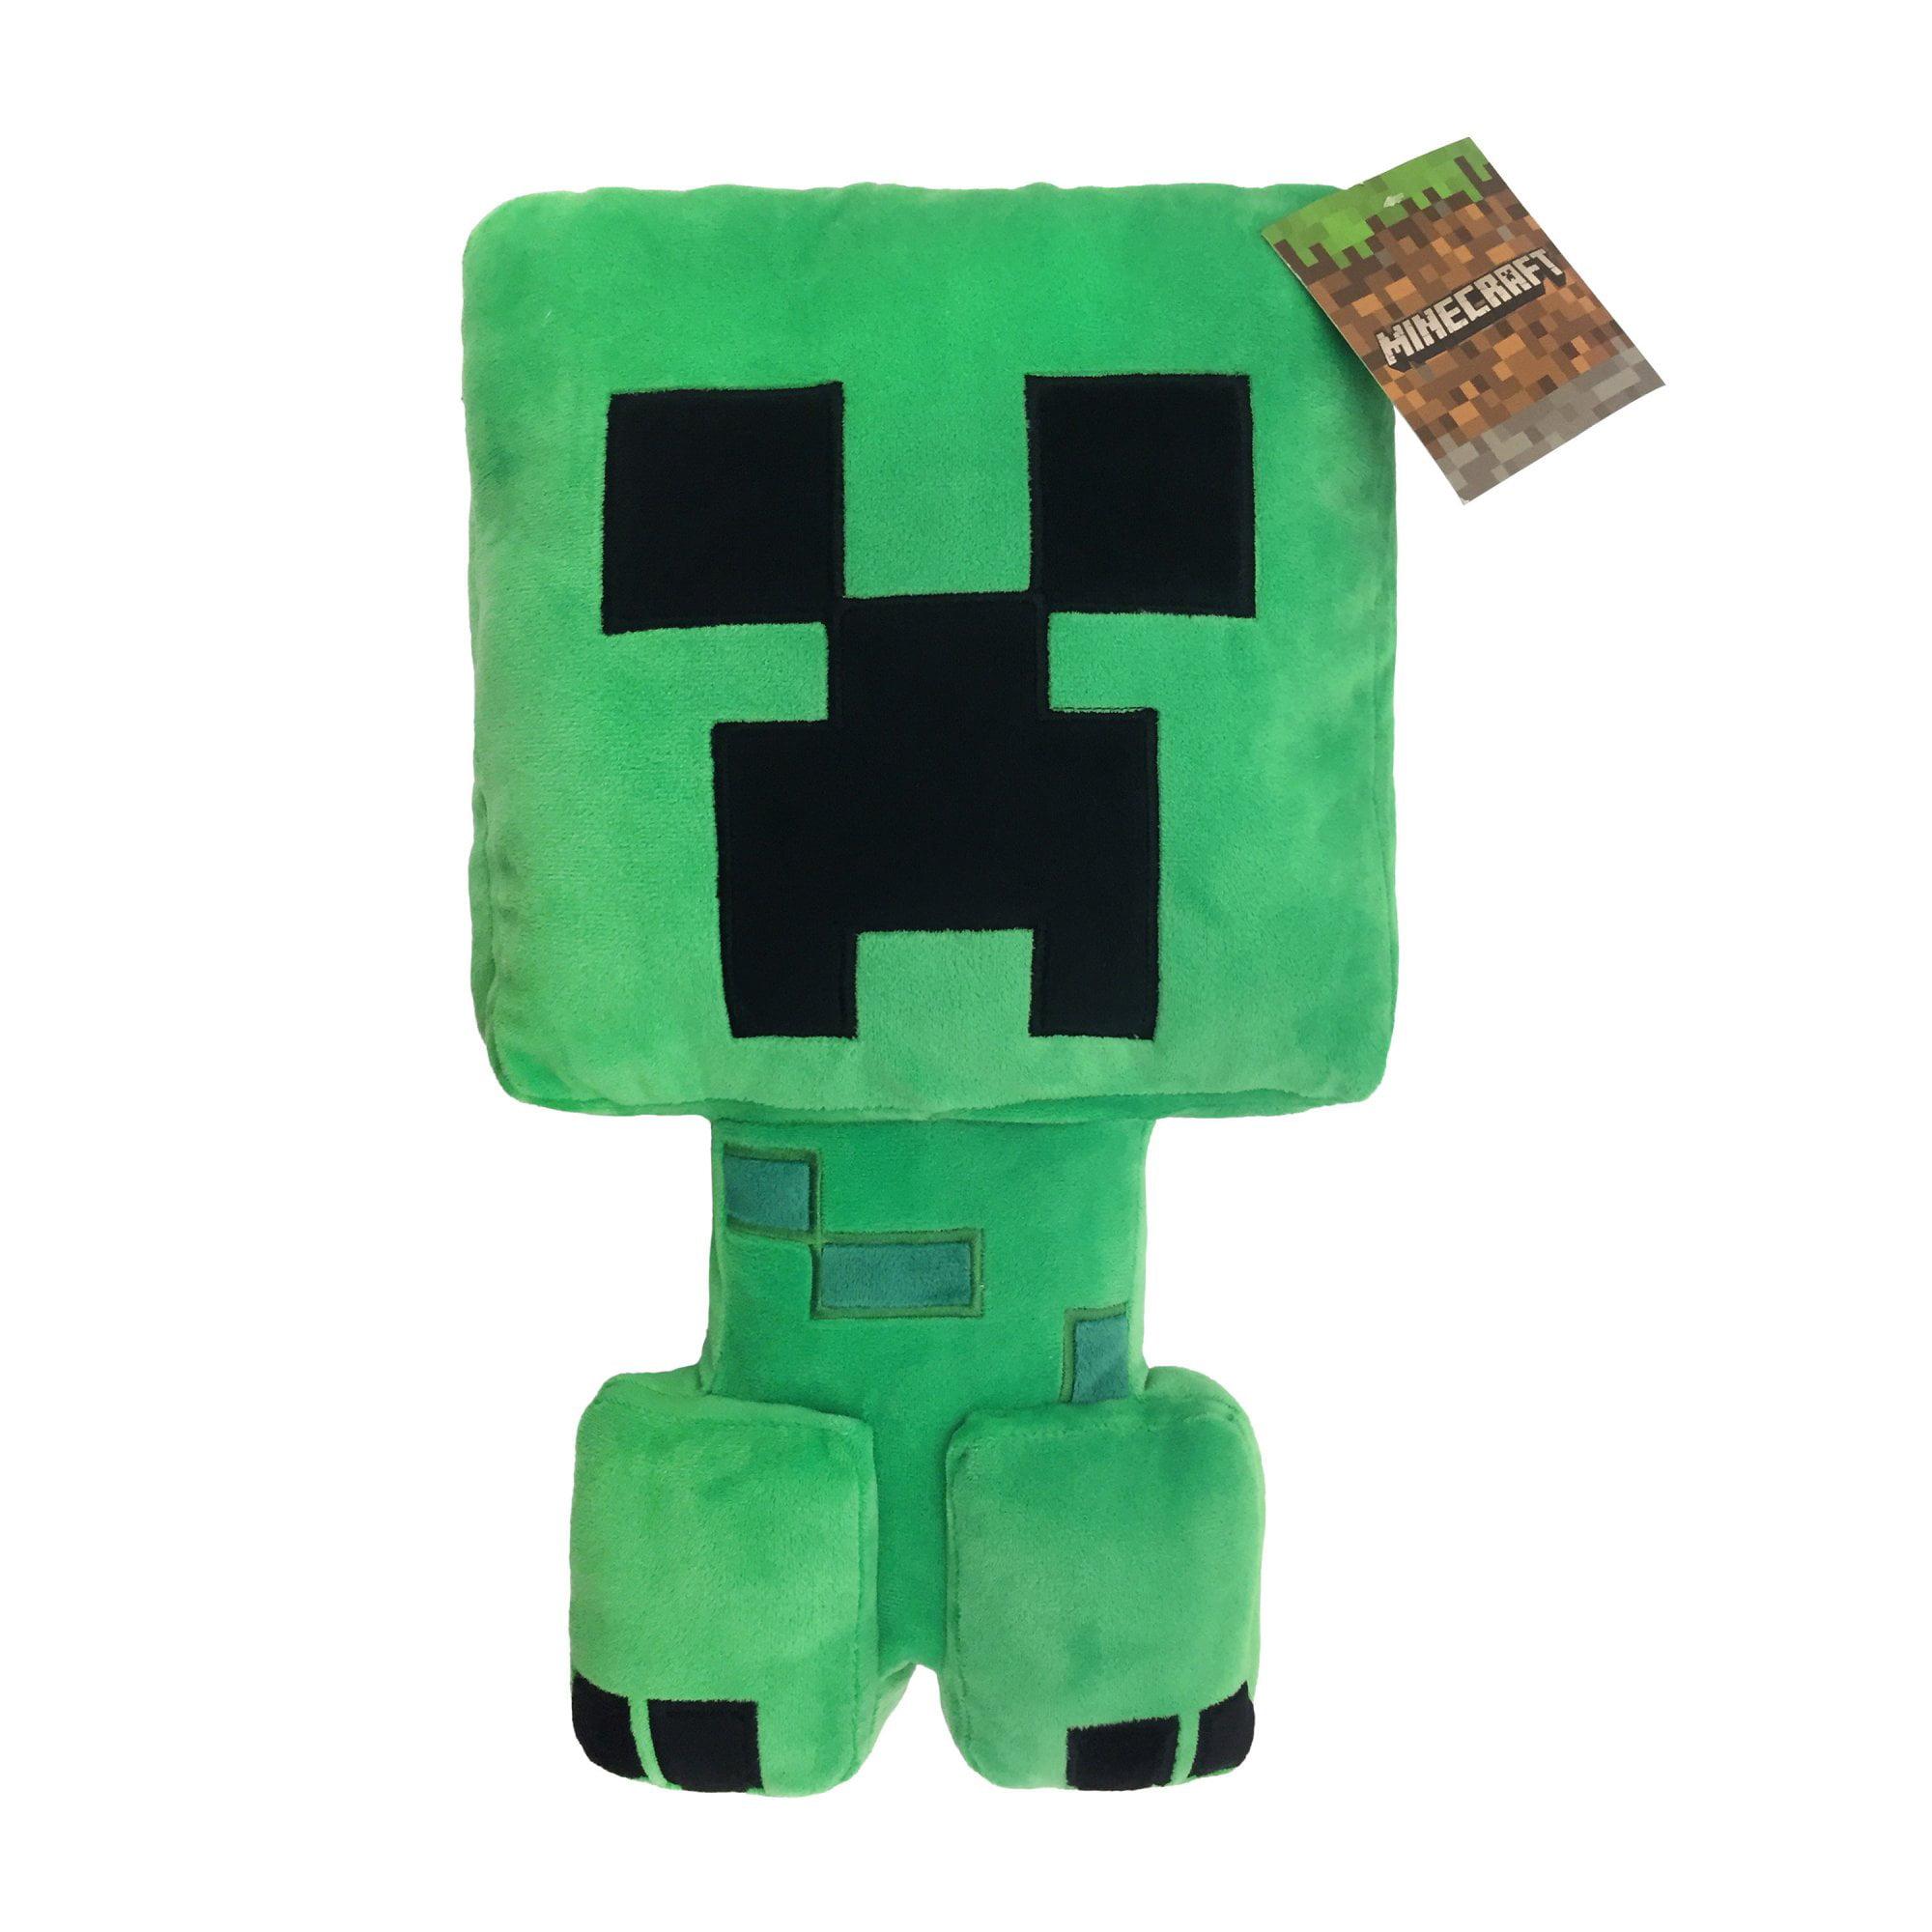 Minecraft Plush Creeper Pillow Buddy by Jay Franco